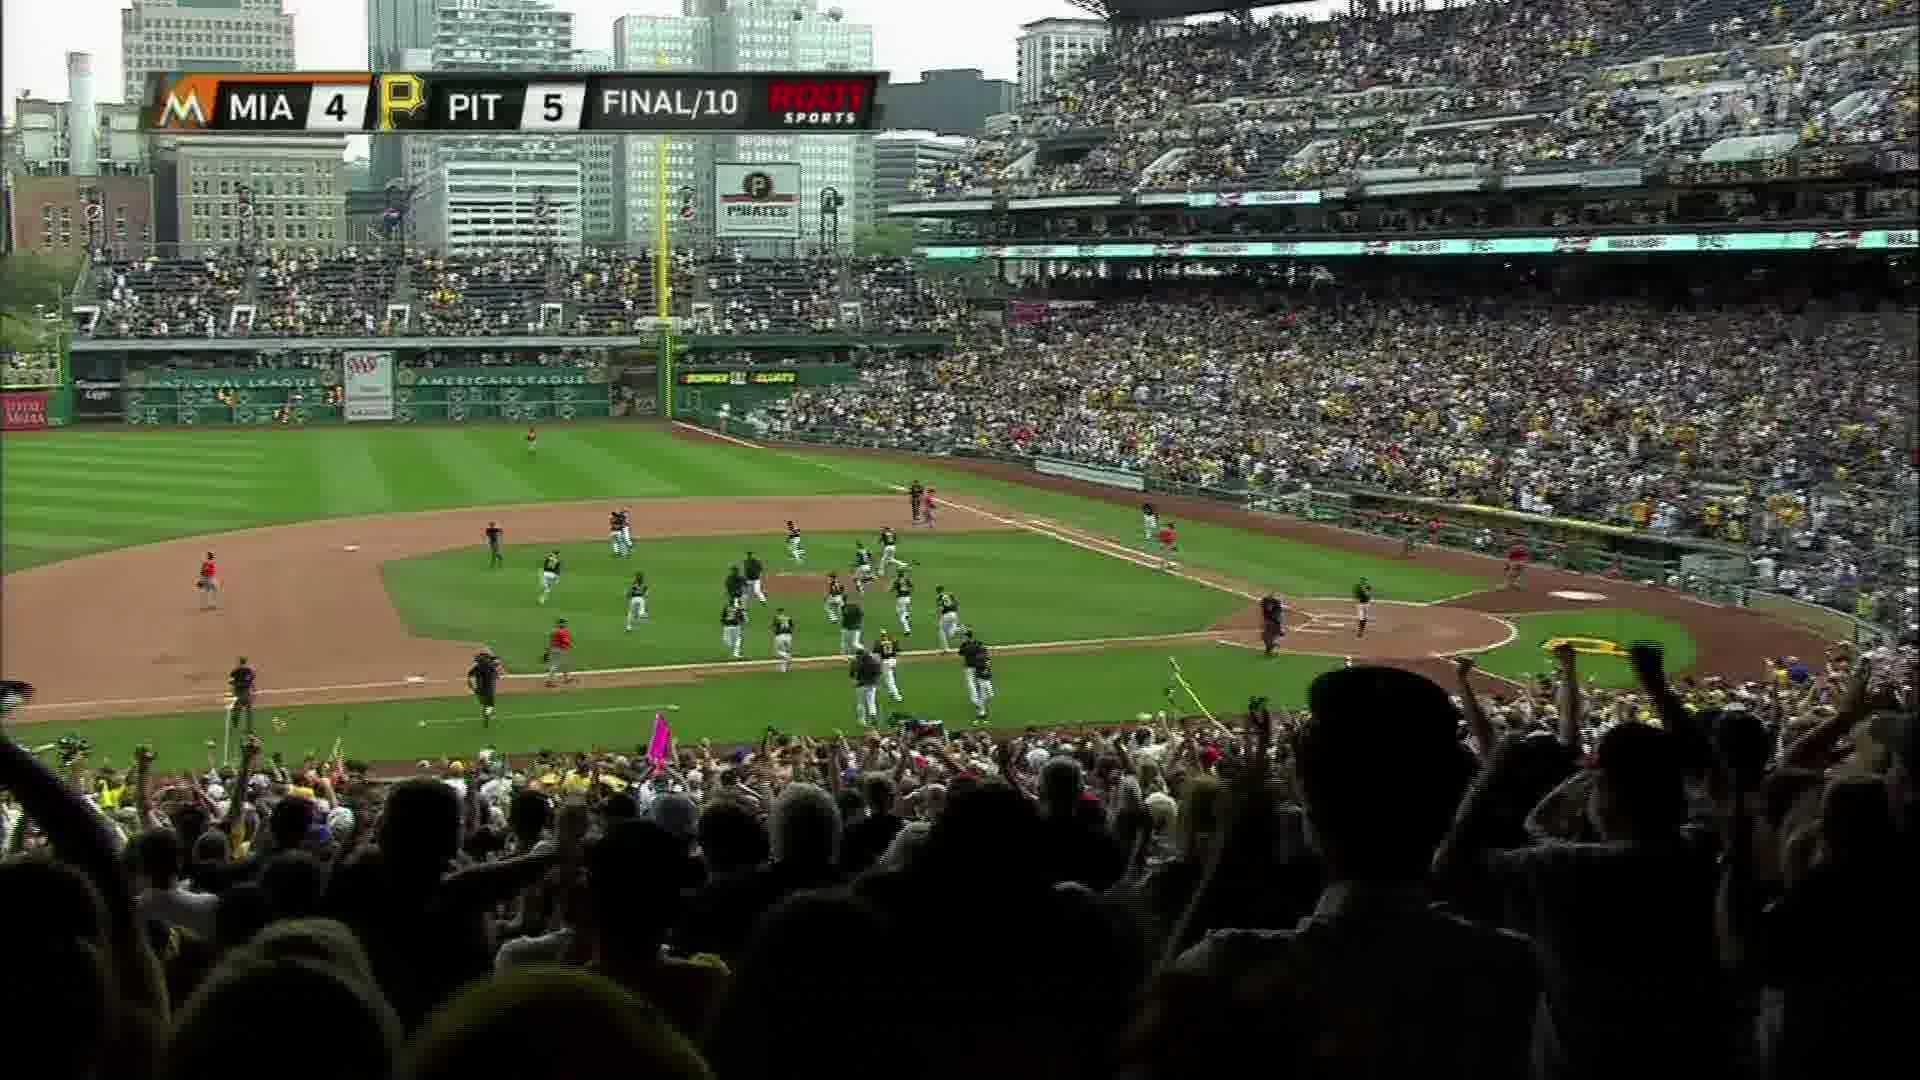 Pirates celebrate after Martin walk-off